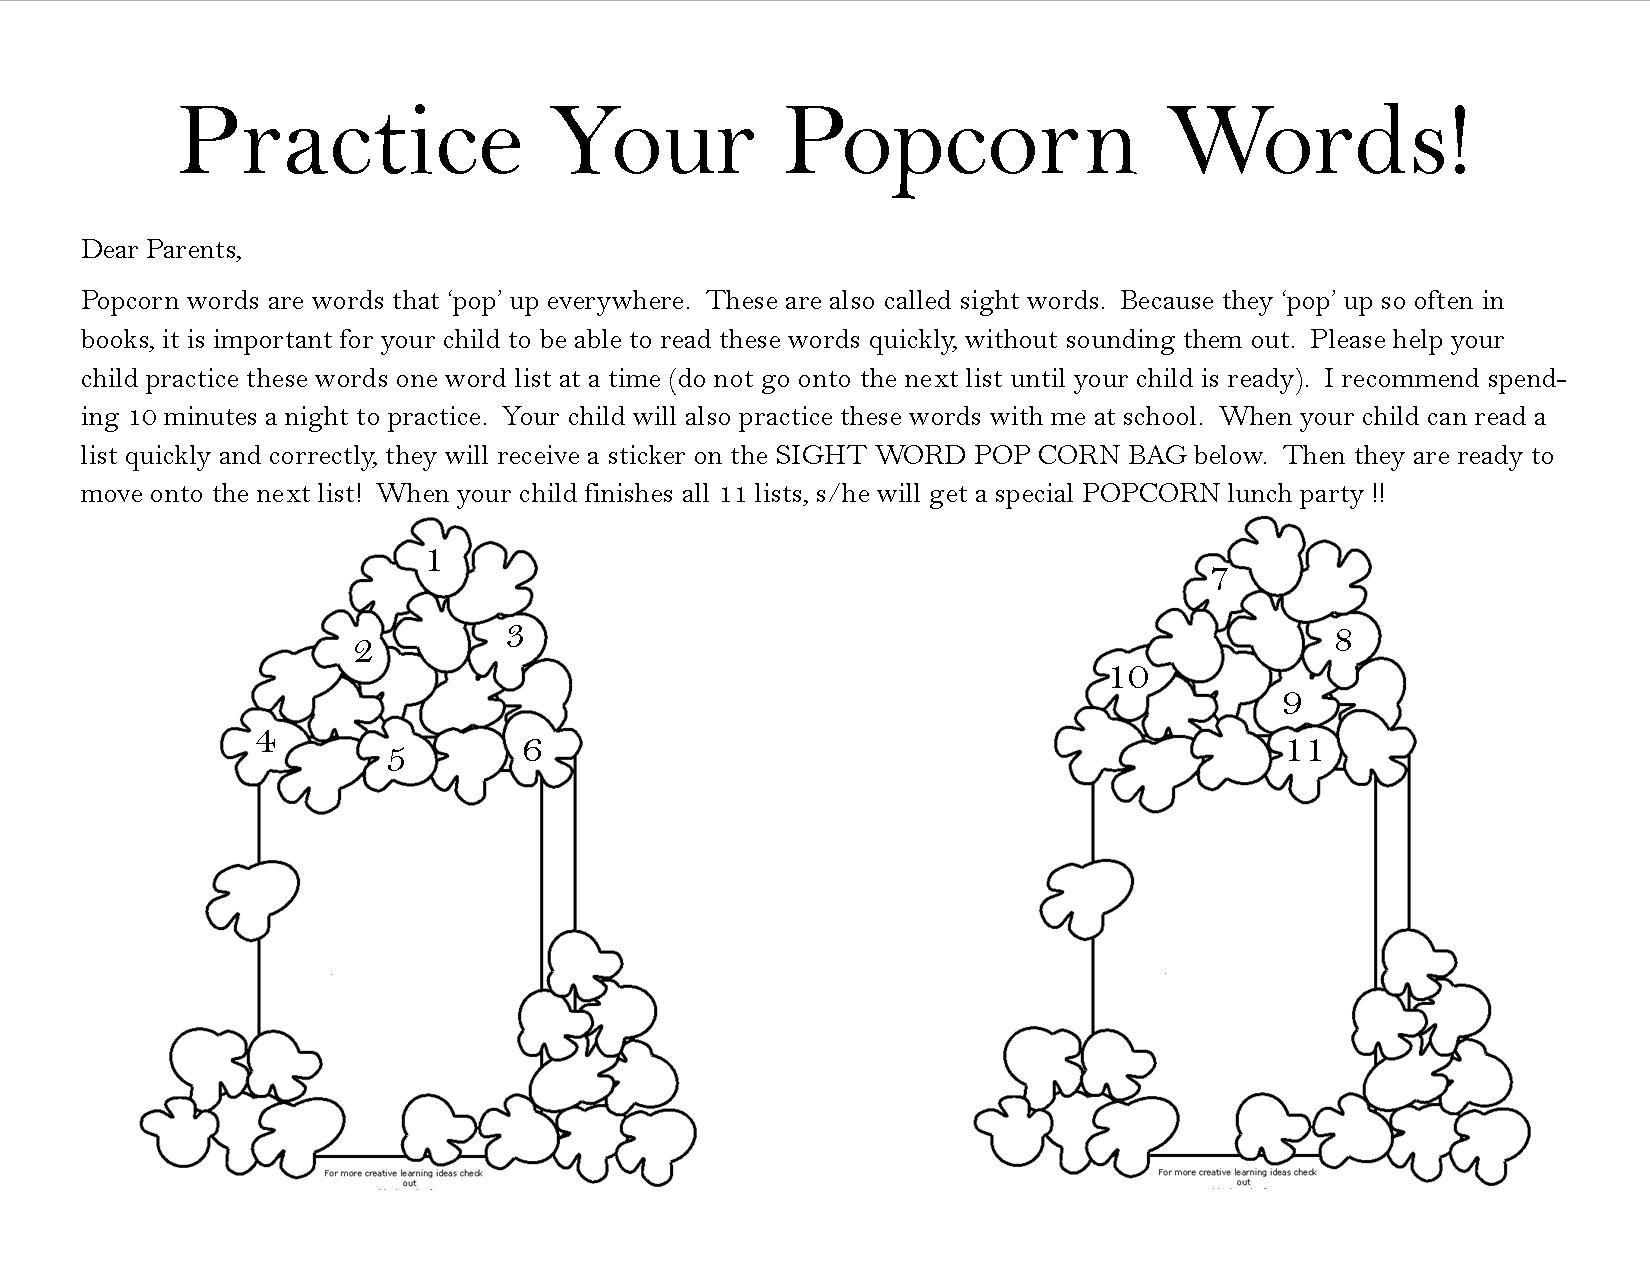 Popcorn Sight Words Parent Letter